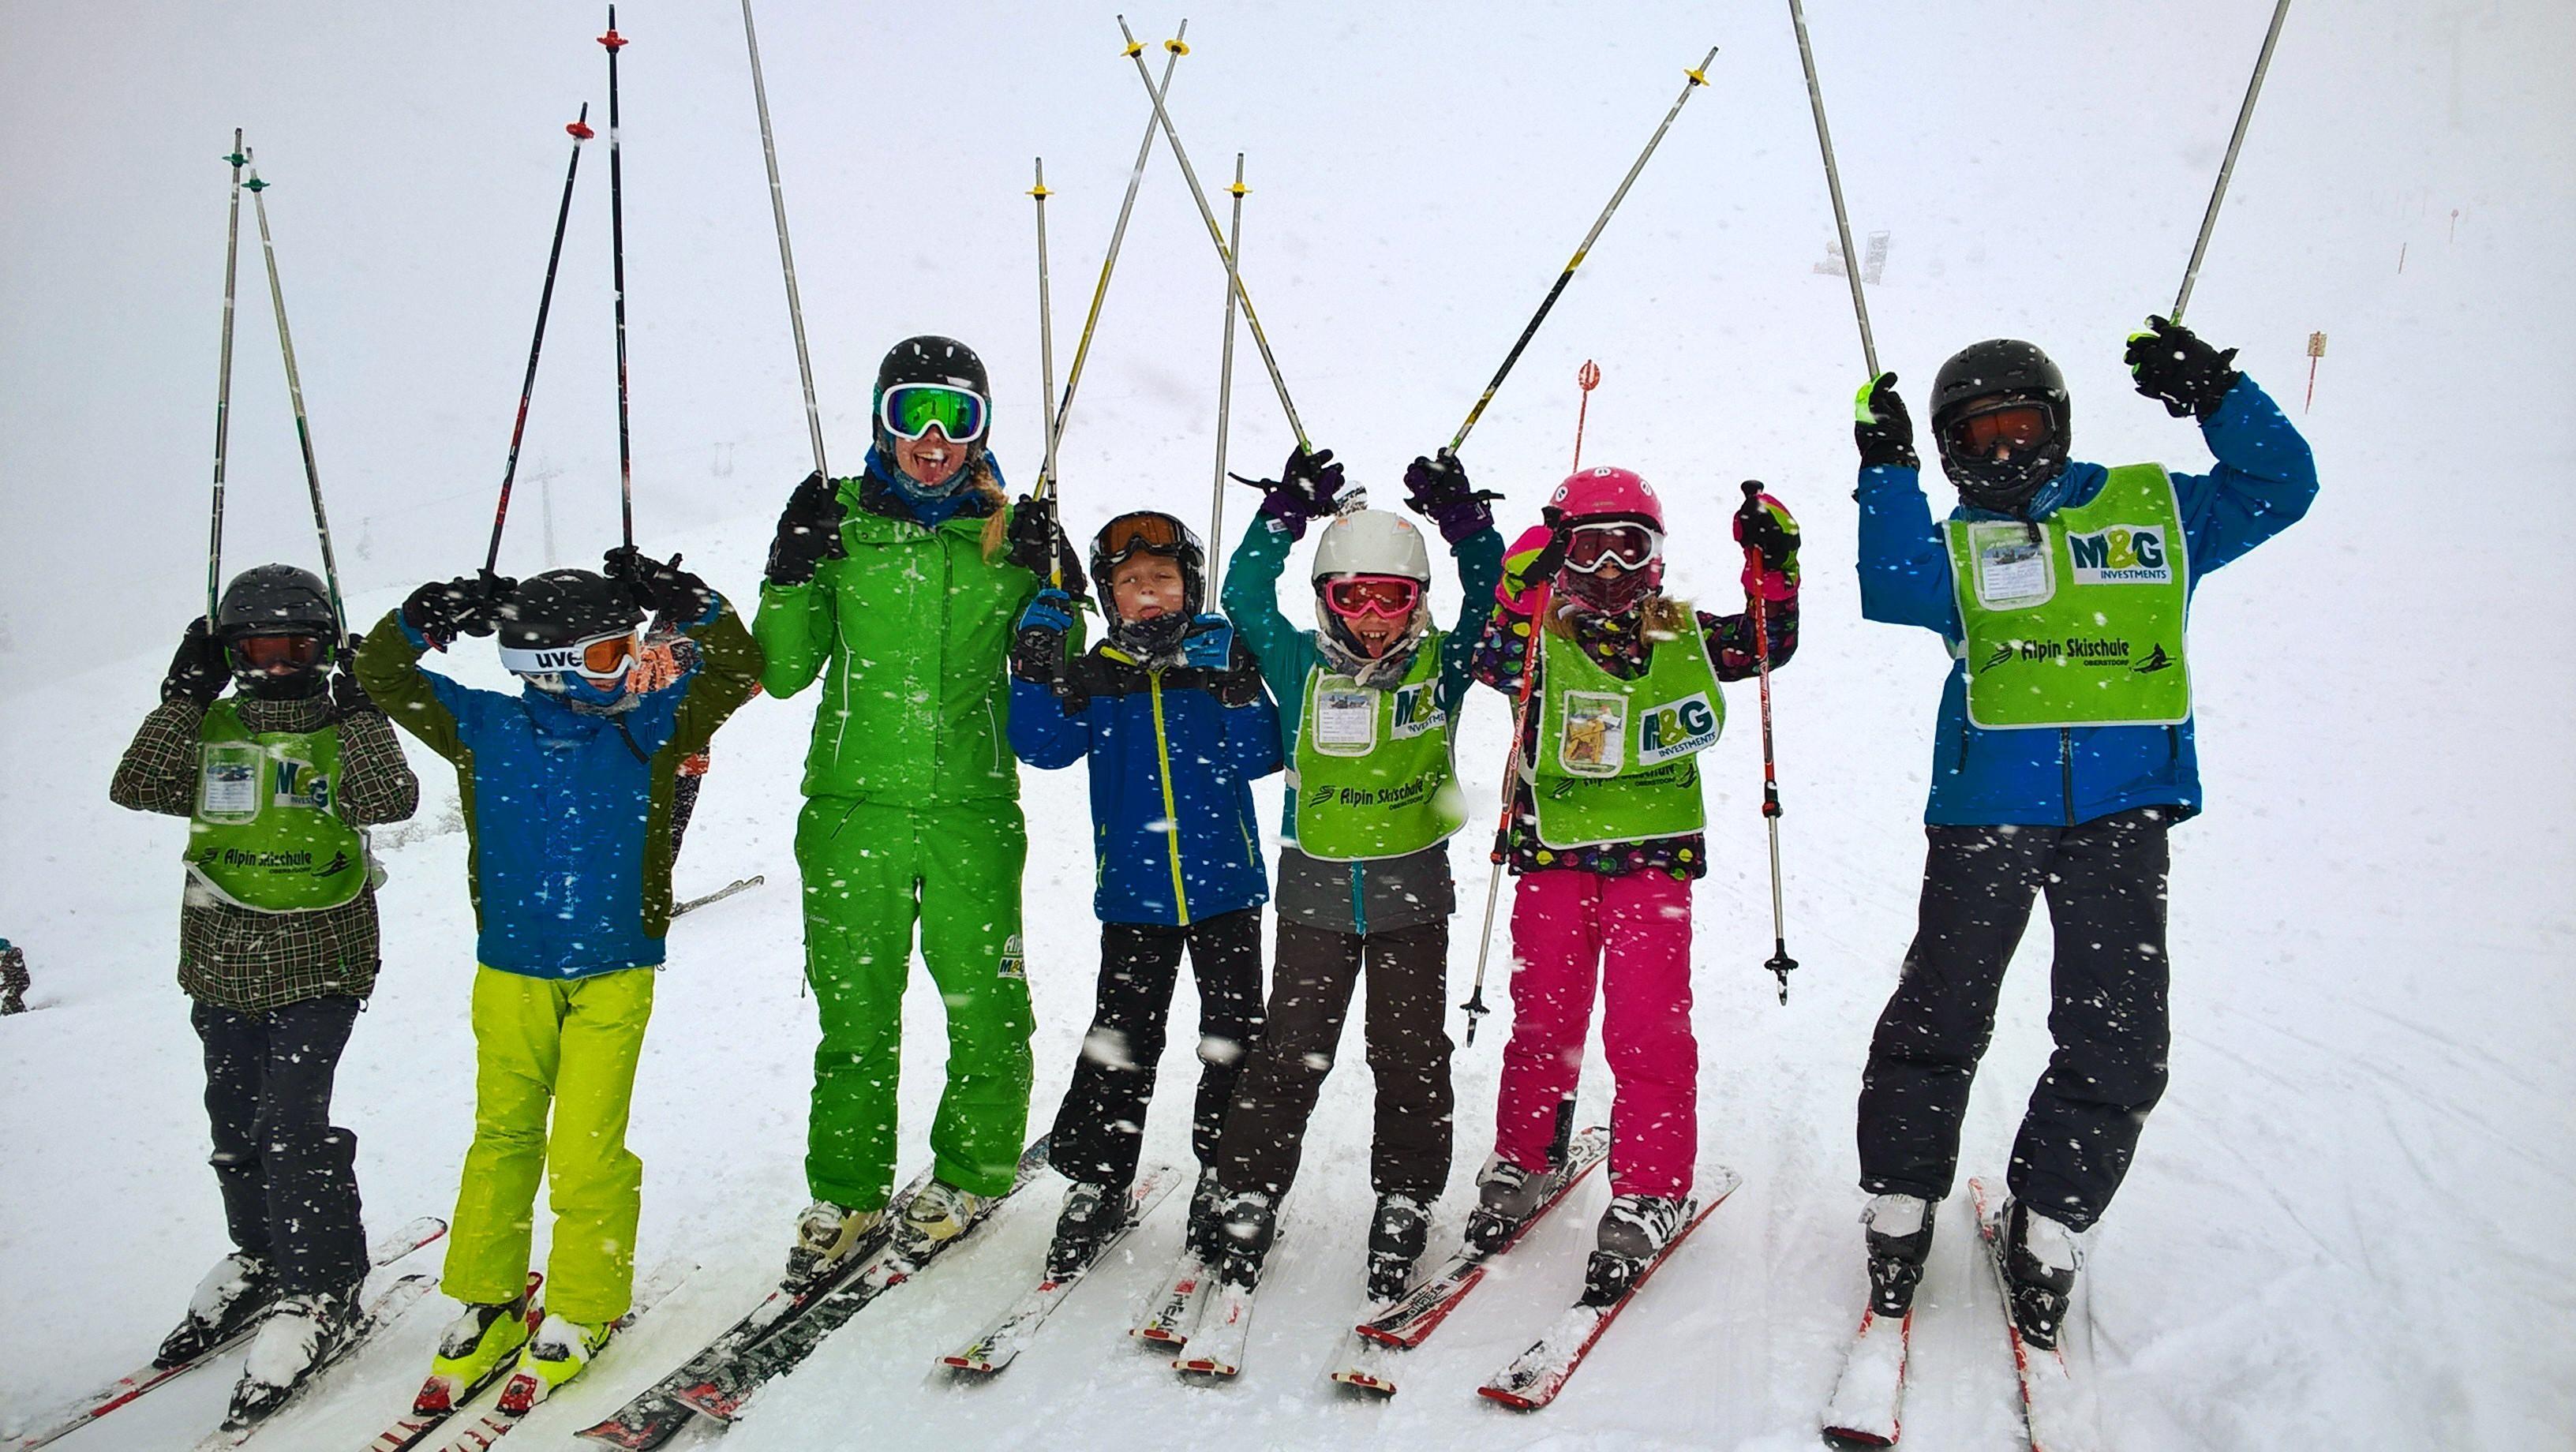 Kids Ski Lessons (9-17 y.) for Advanced Skiers